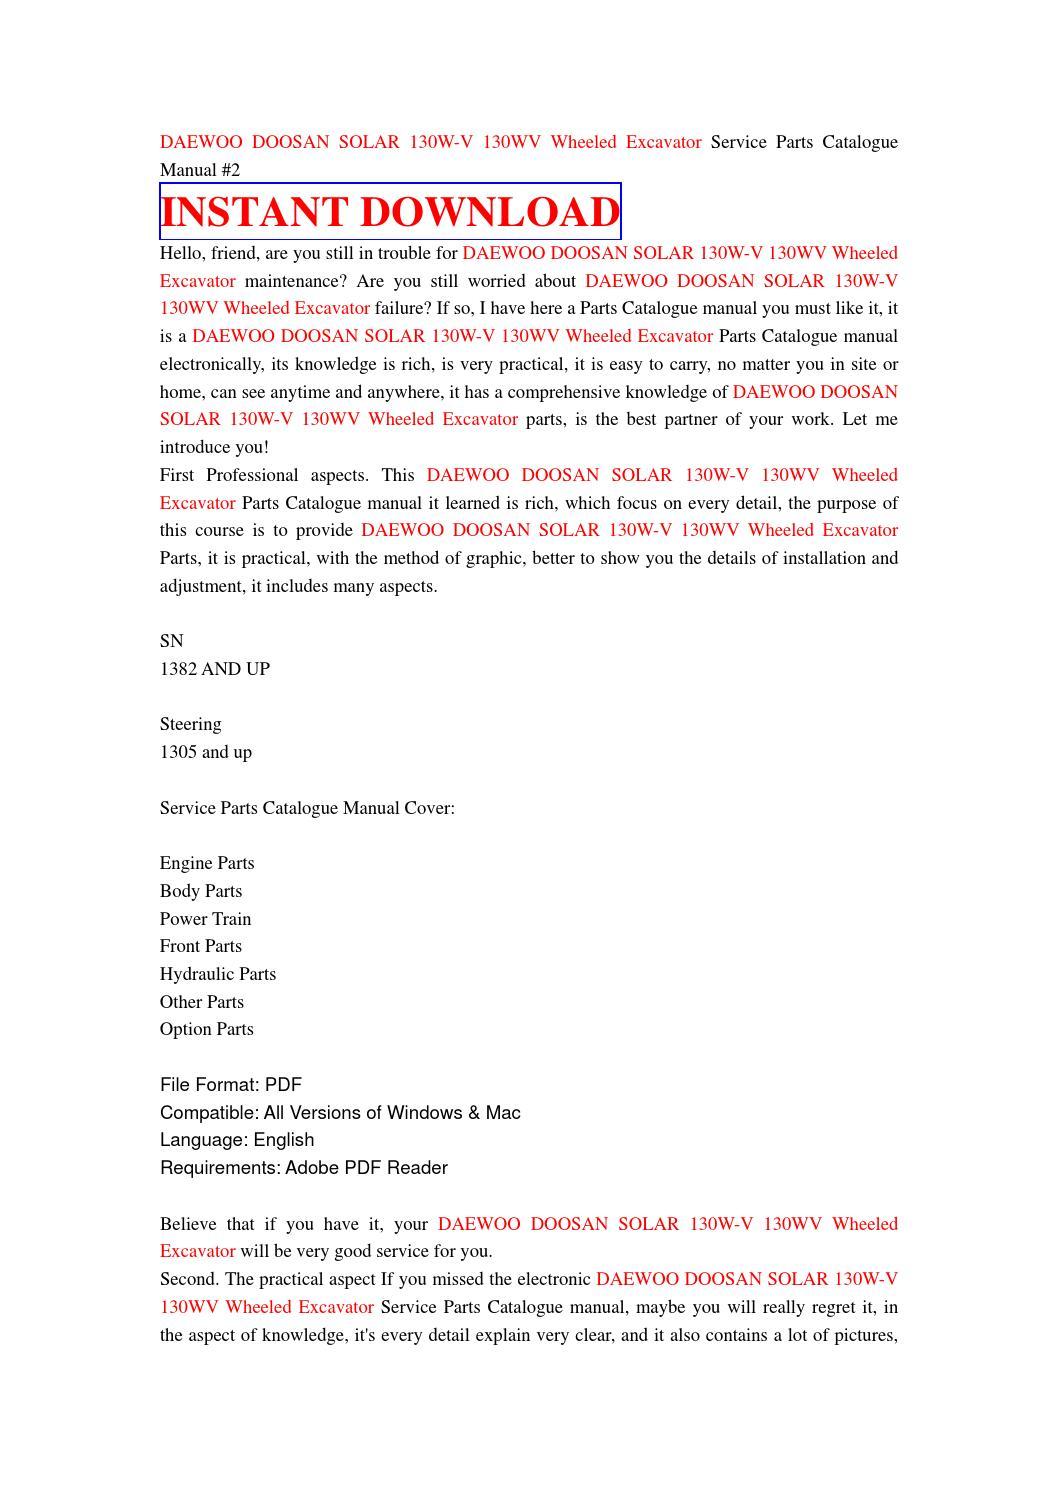 Daewoo doosan solar 130w v 130wv wheeled excavator service parts catalogue  manual #2 by nhsjefnhe7d - issuu